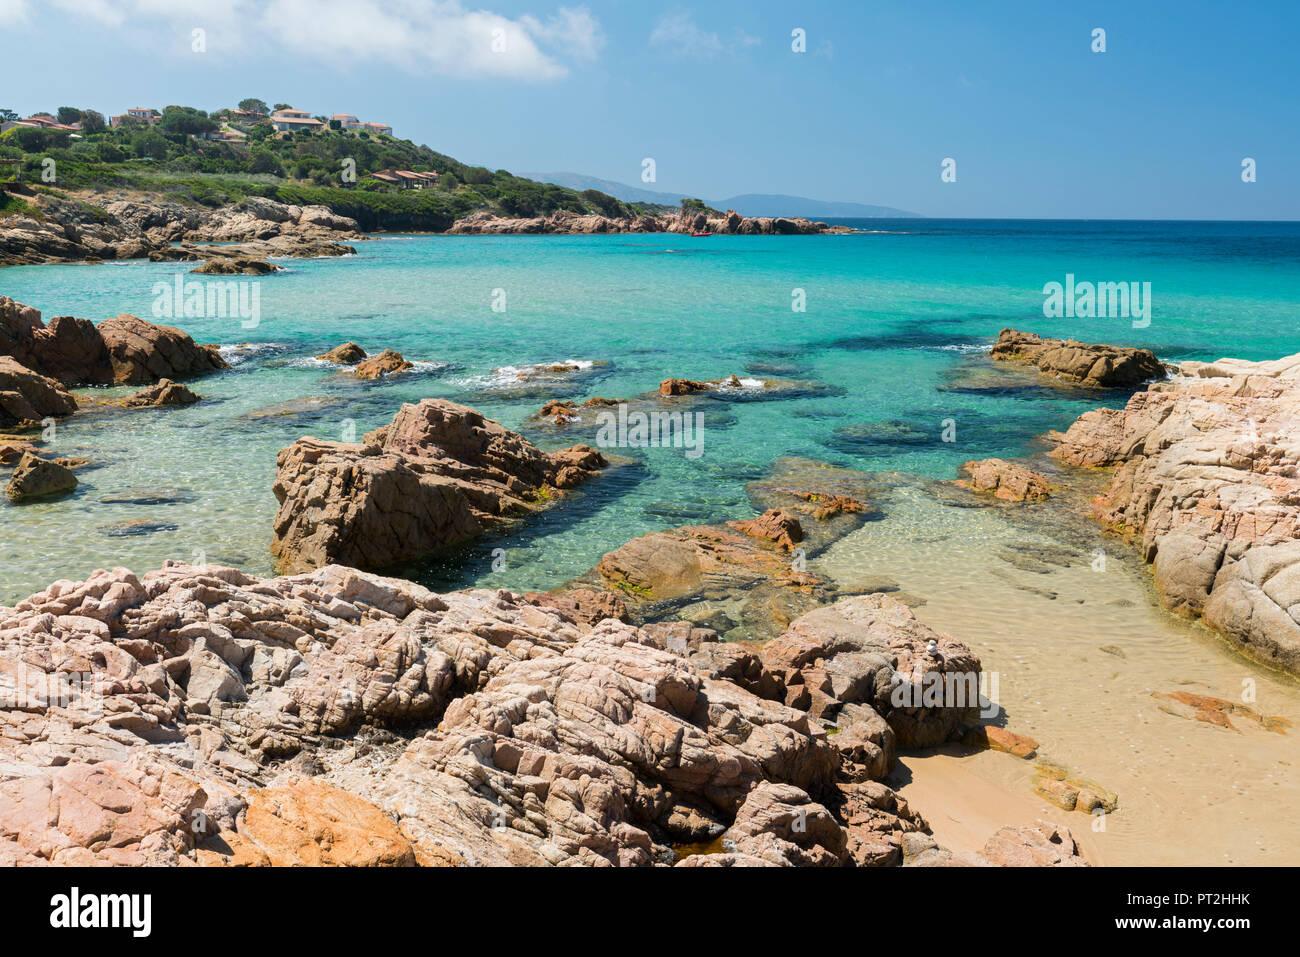 Plage d'Esigna, Sagone, Corsica, France - Stock Image